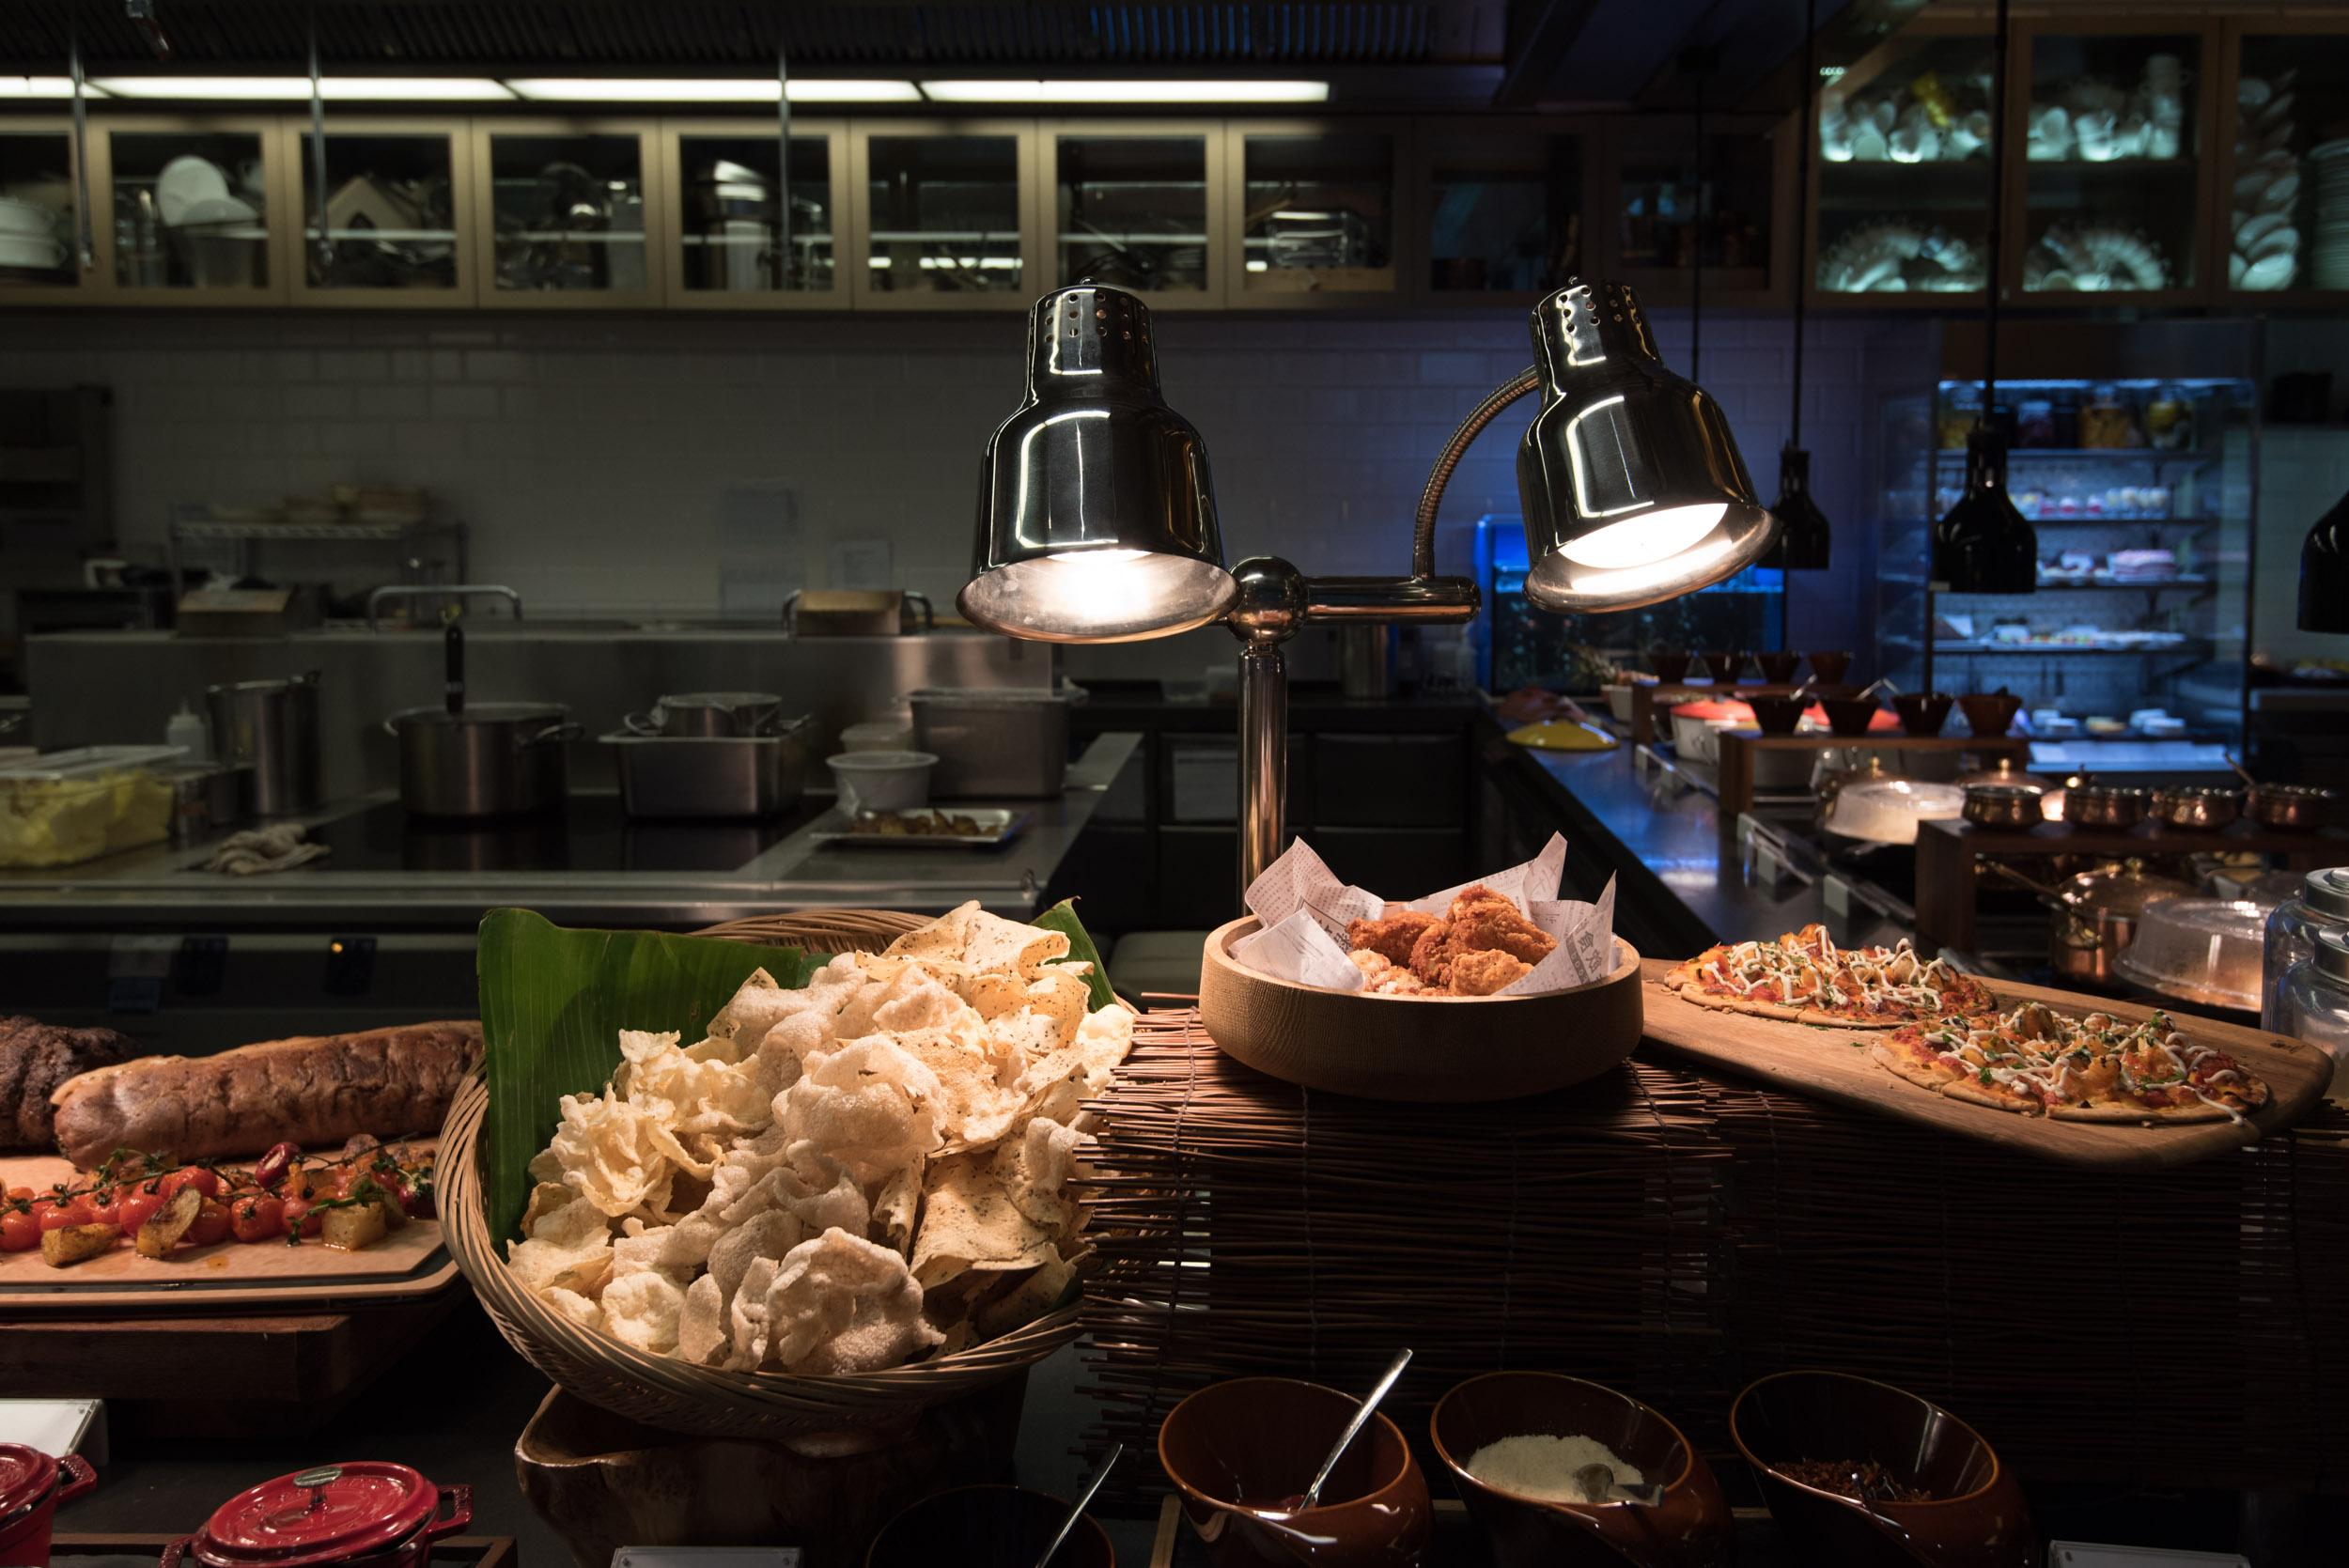 Delicious Finger Food - One Farrer Hotel & Spa (Escape Restaurant)